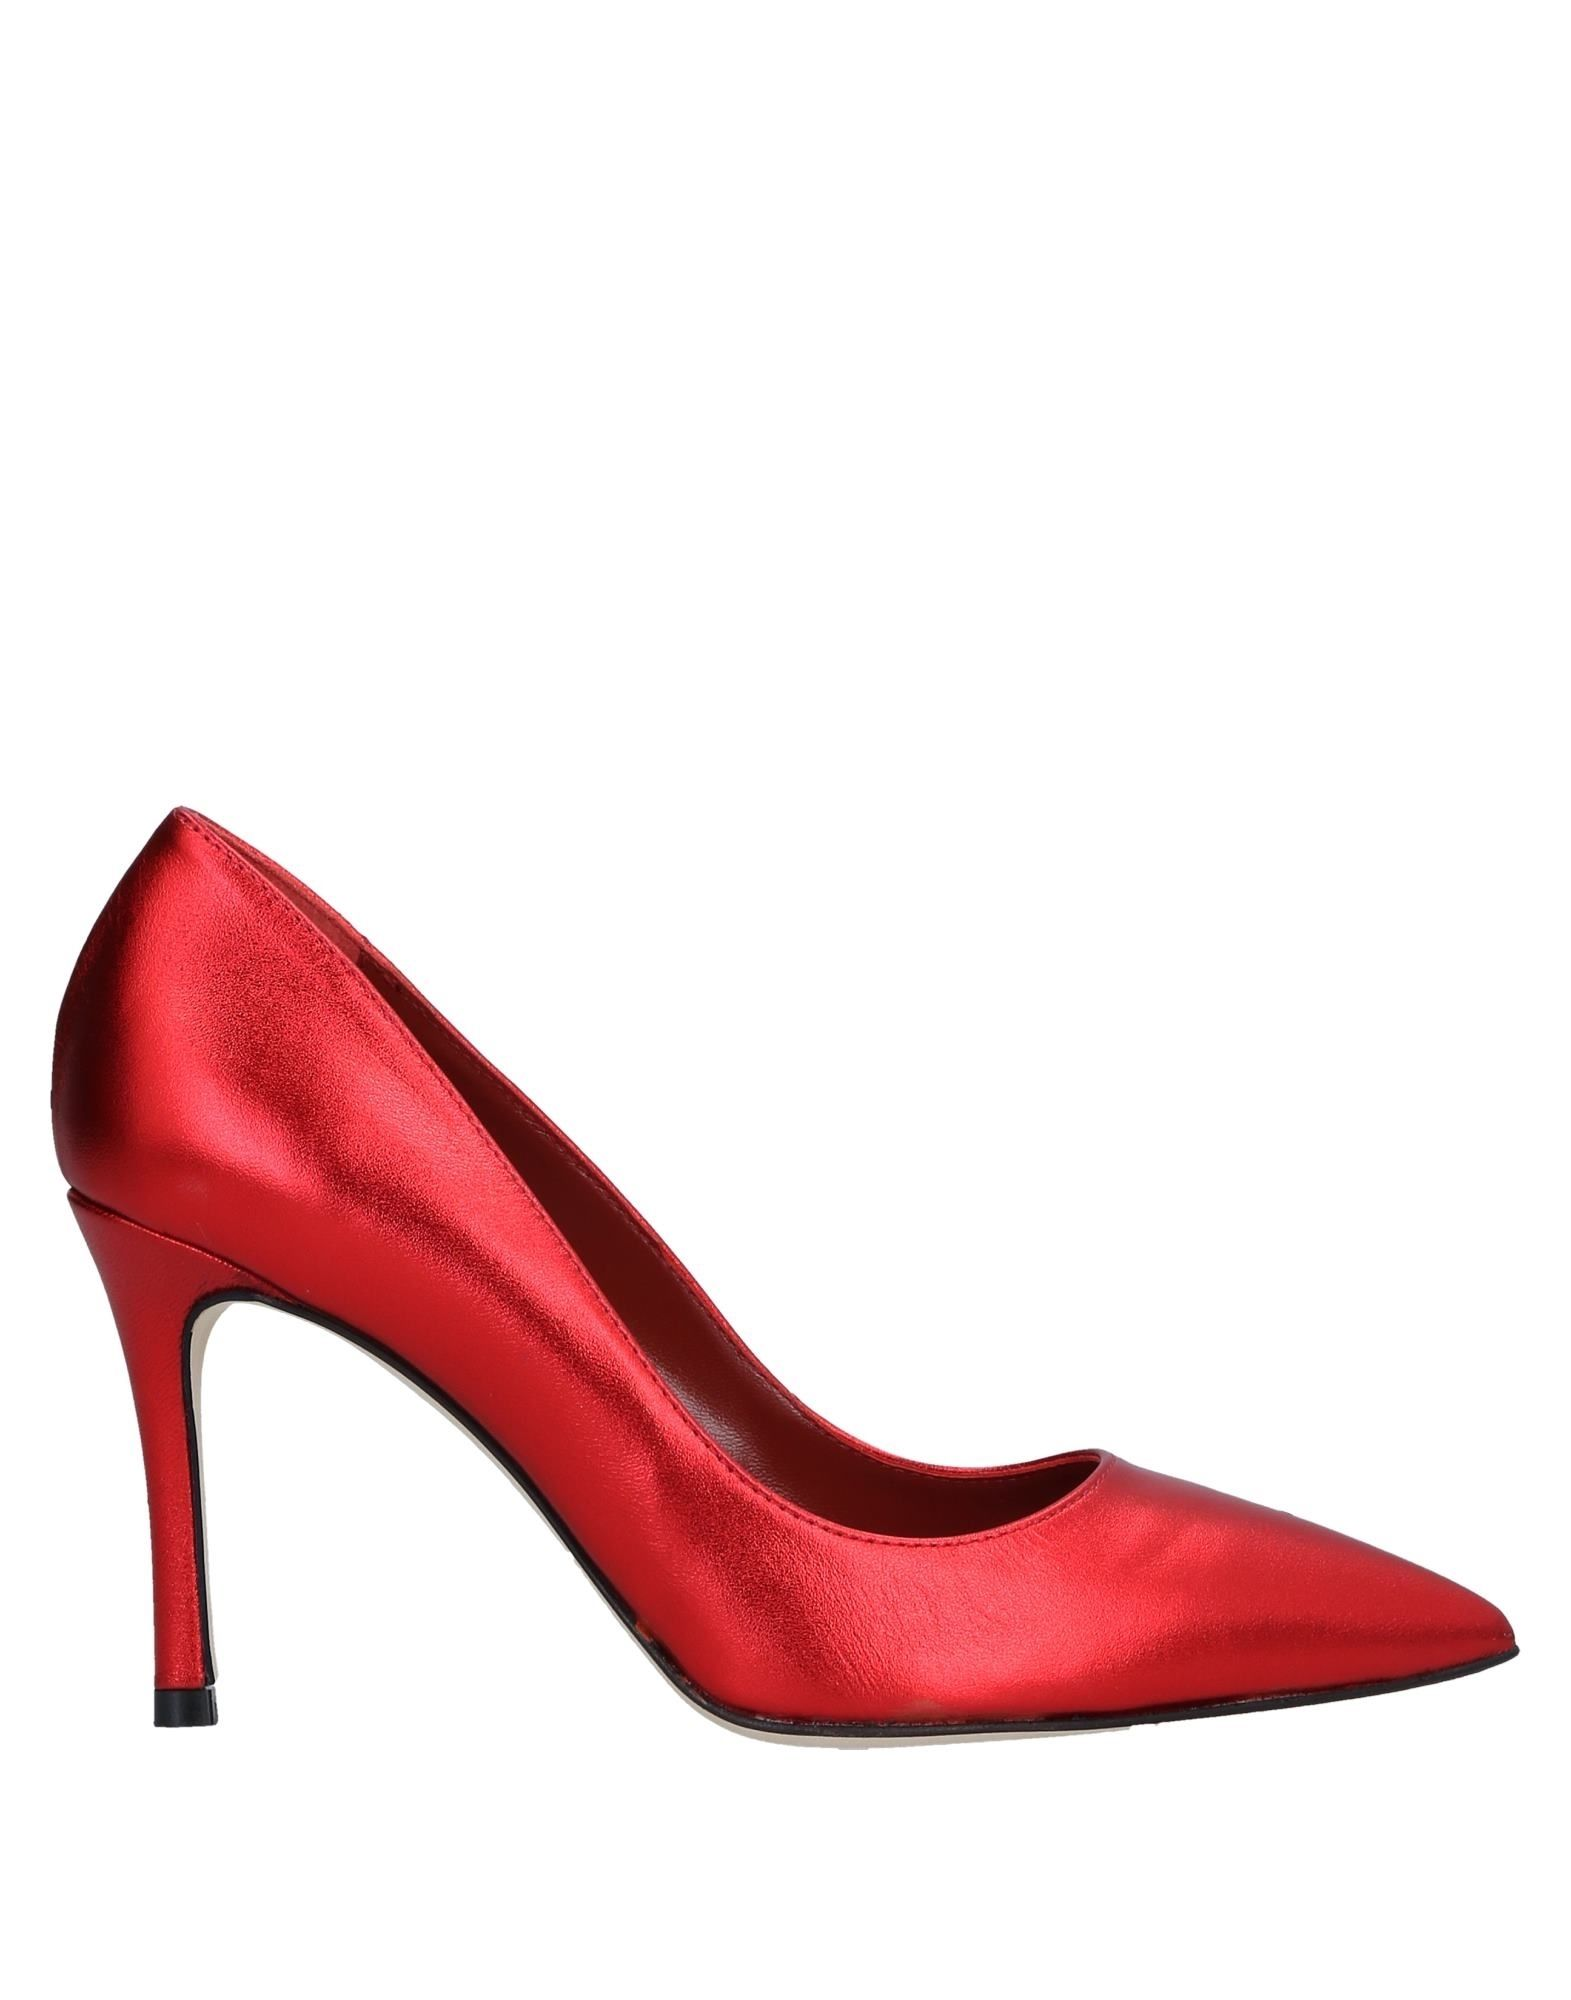 luca luca luca valentini cour - femmes luca valentini tribunaux en ligne le royaume - uni - 11536691ae 14444e